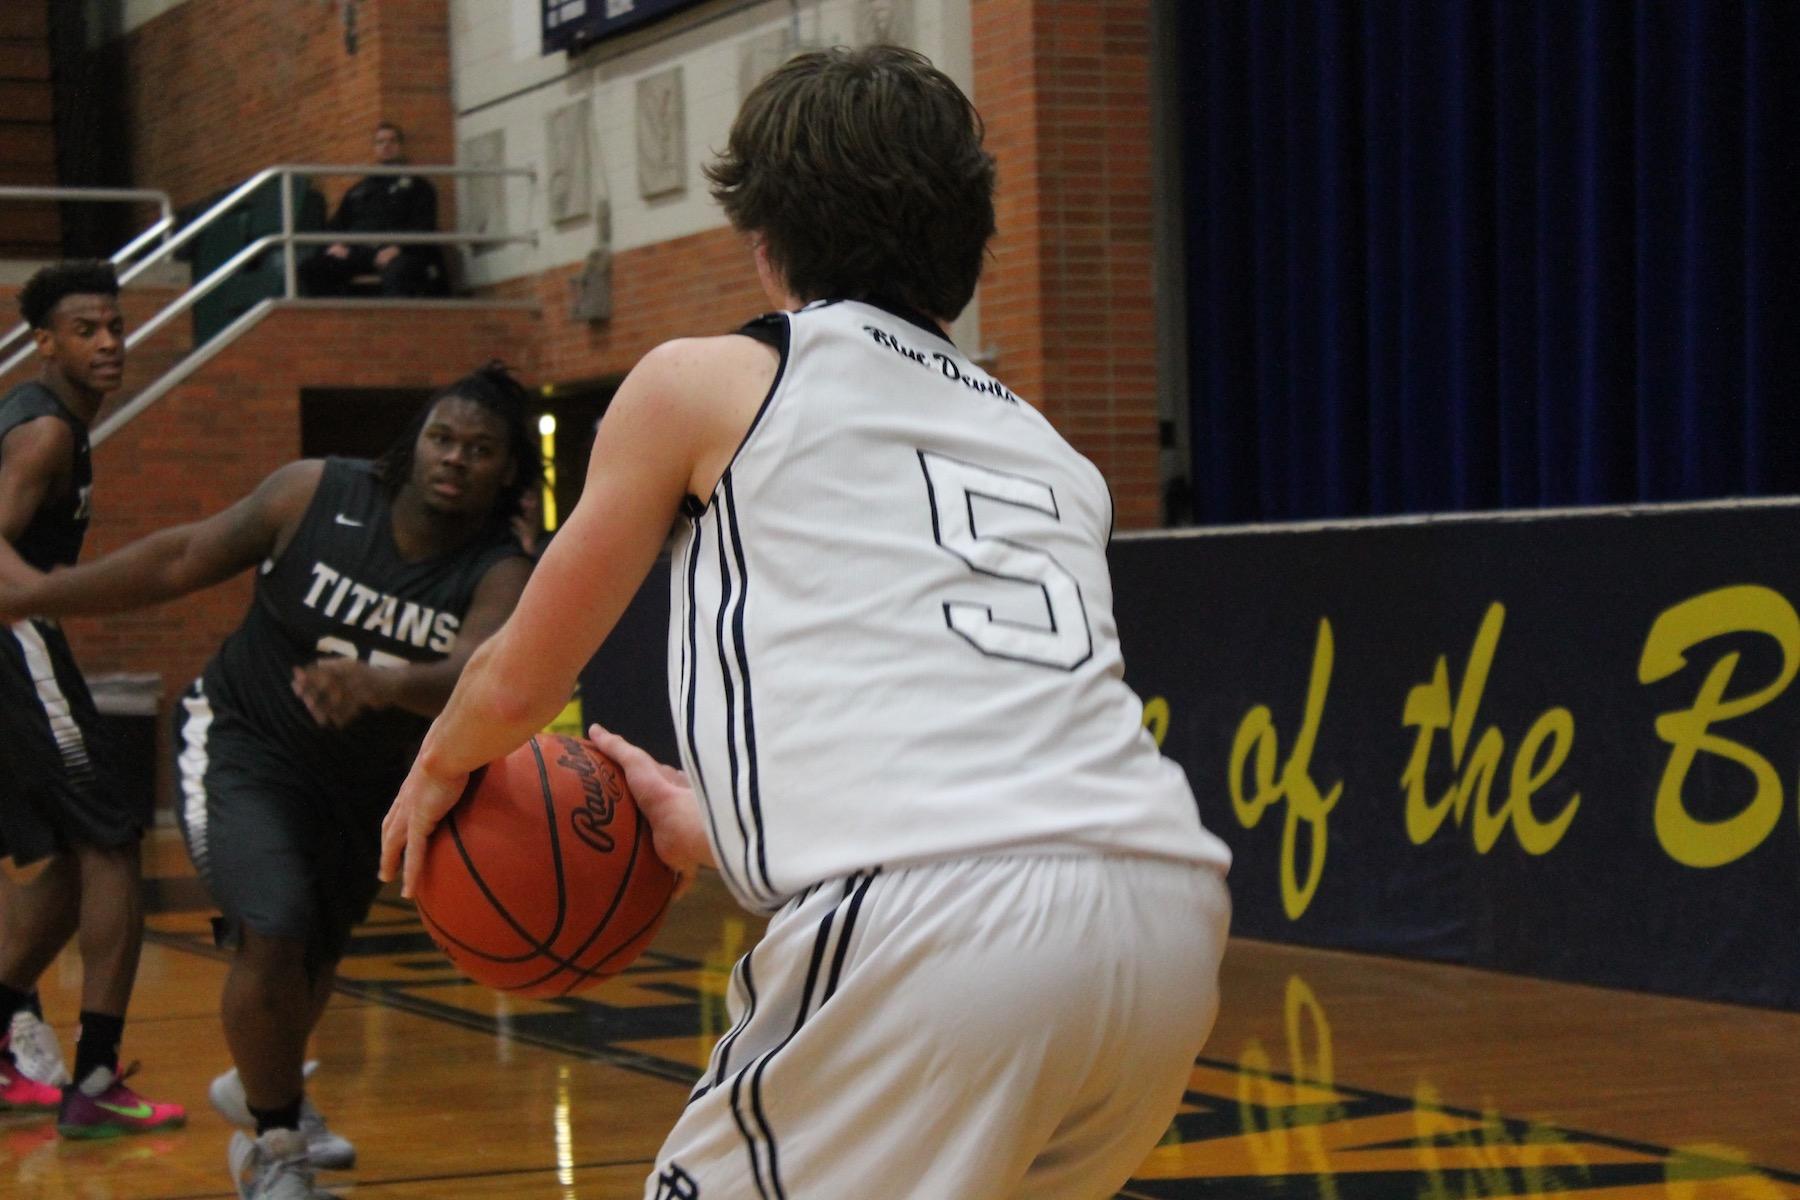 Boys varsity basketball team plays against Utica Stevenson.